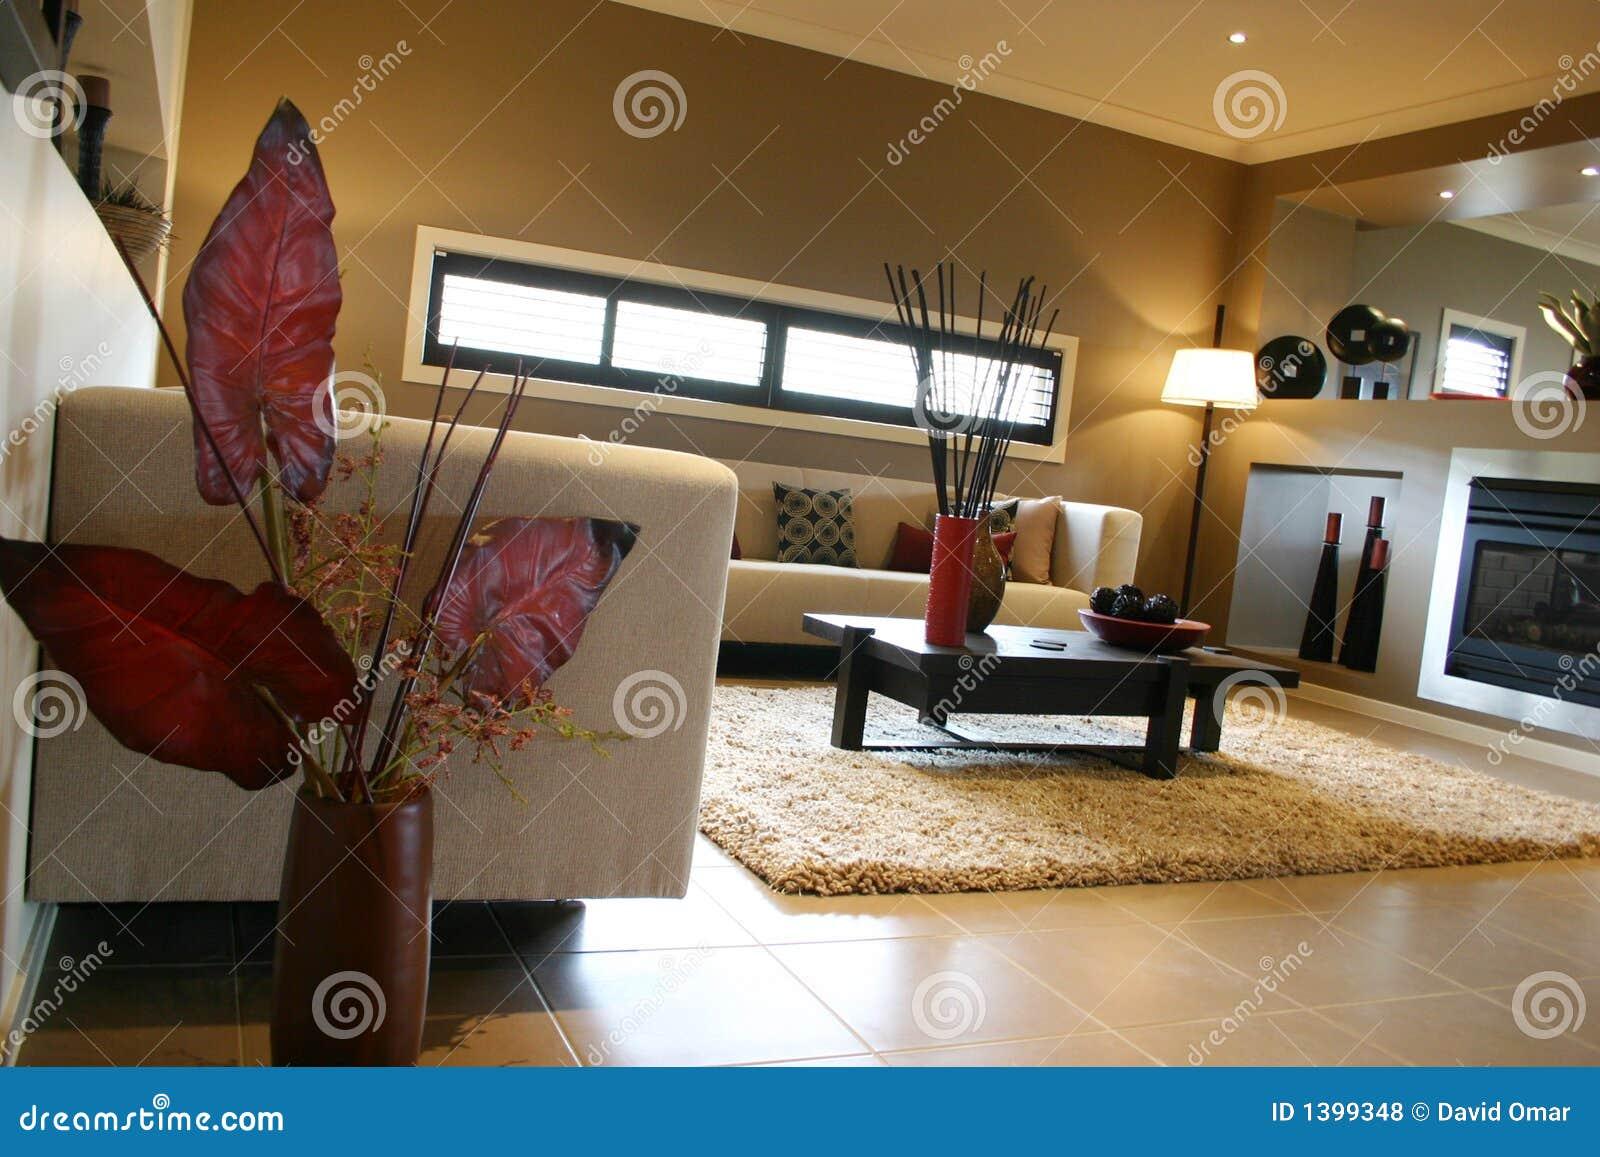 Luz natural interior casera